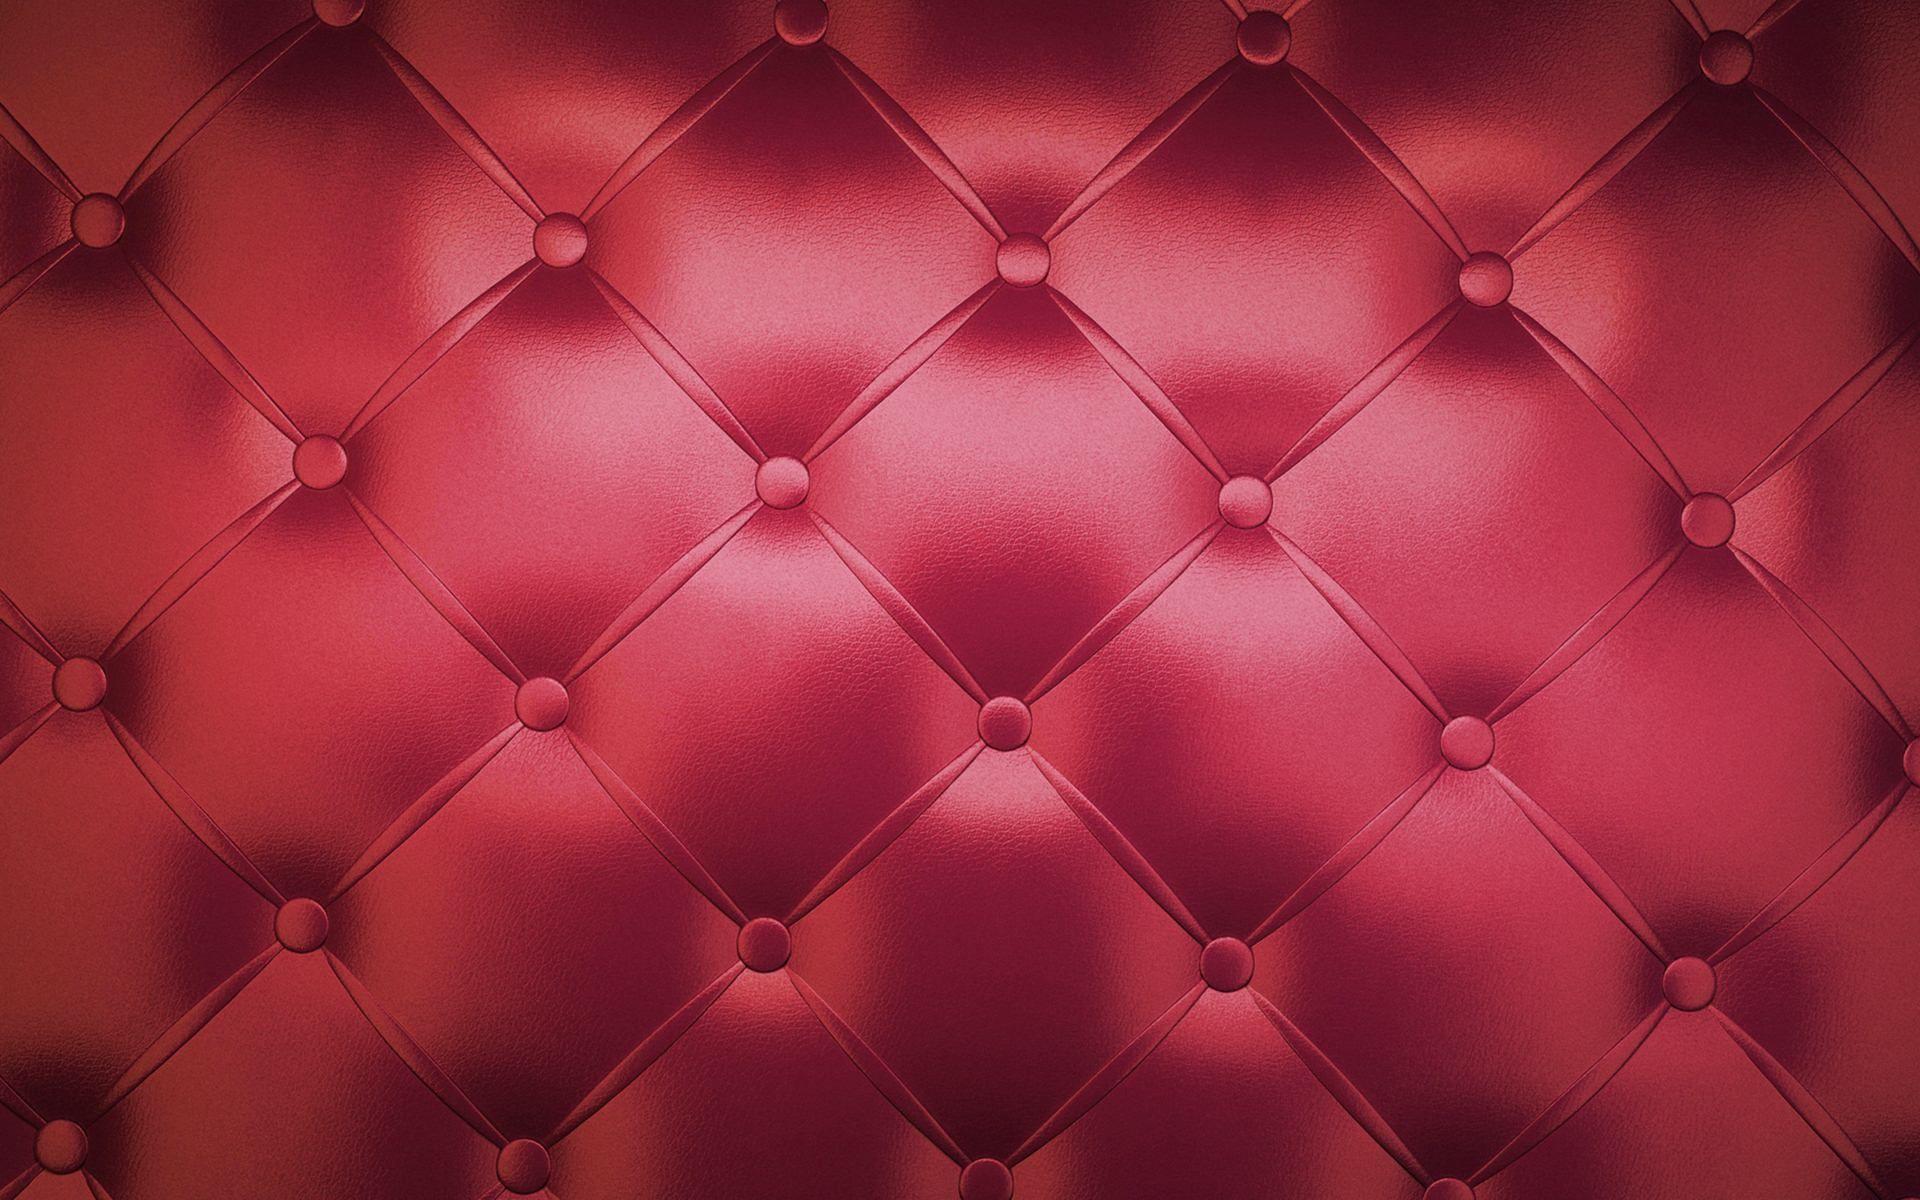 Pin By Vinayak 25 On Design Patterns Amp Texture Sofa